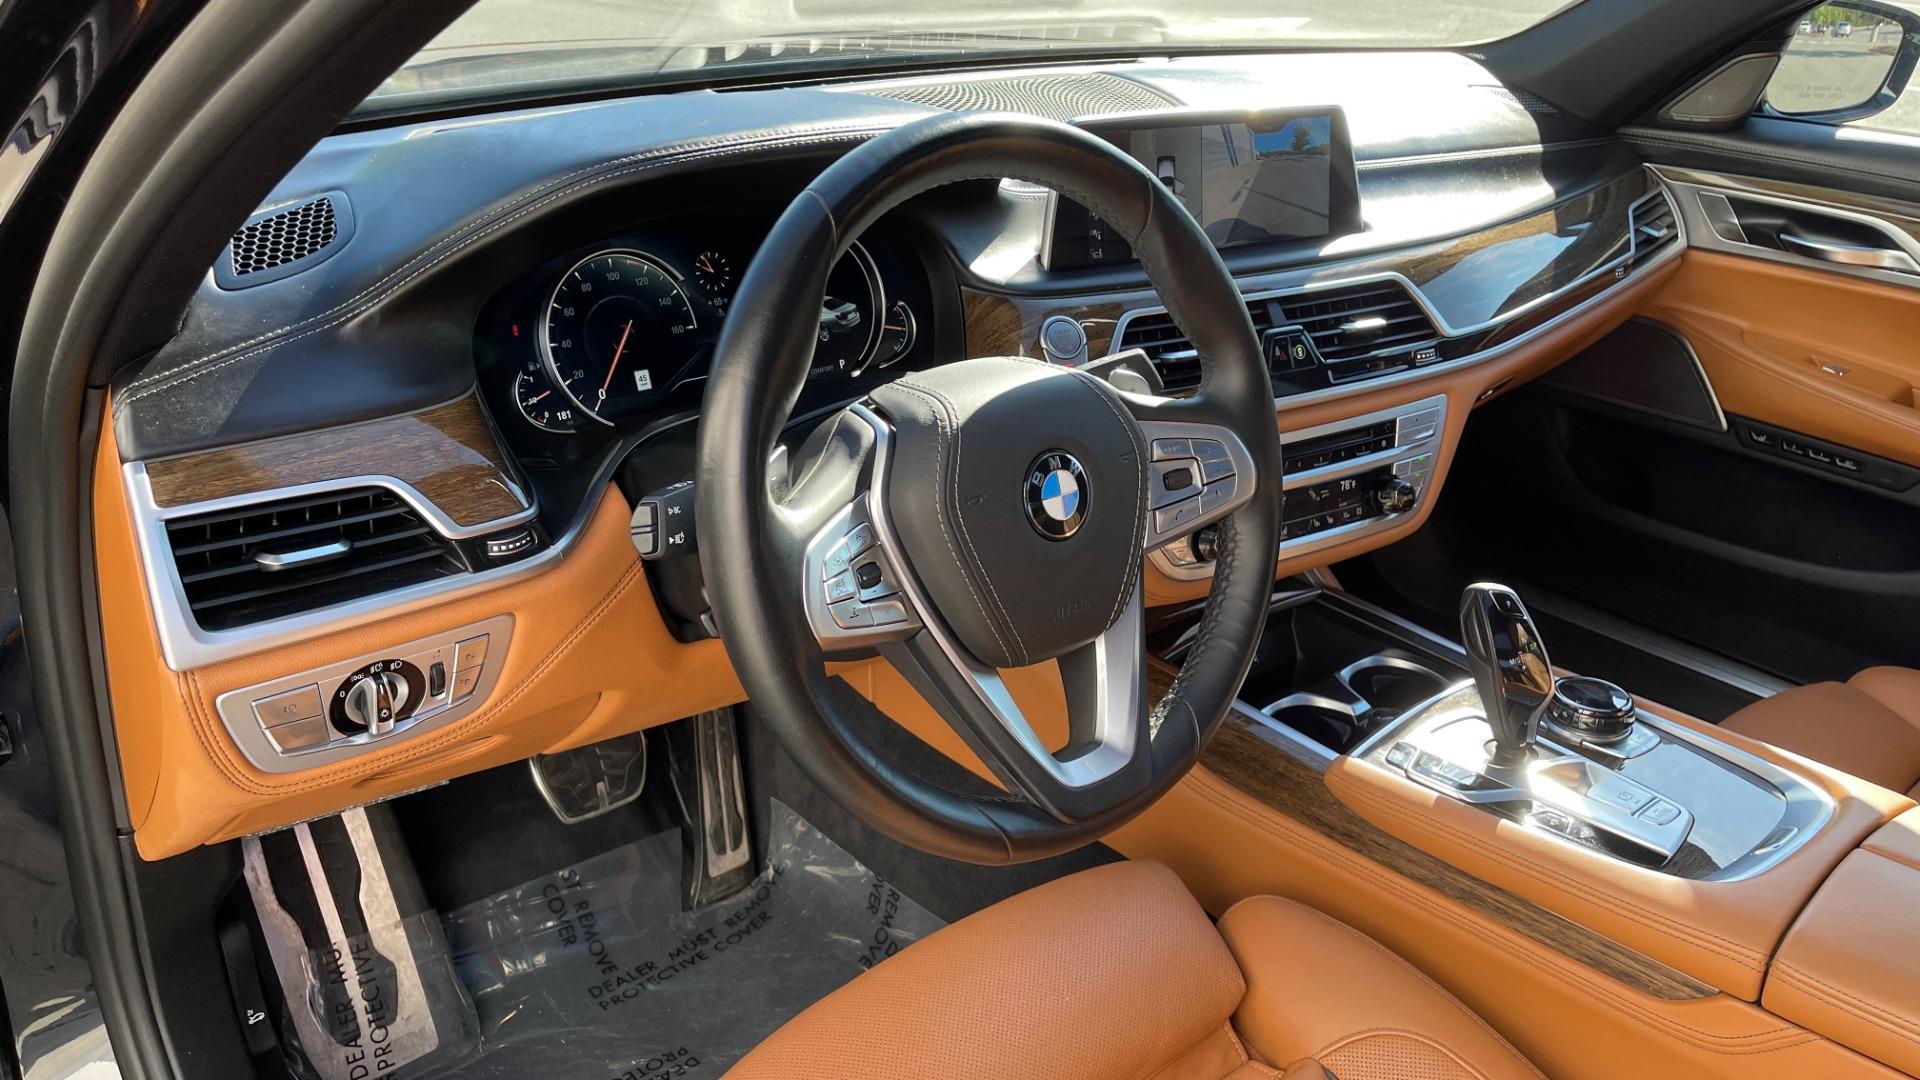 Used 2019 BMW 7 SERIES 750I XDRIVE M-SPORT / EXEC PKG / DRVR ASST PLUS / CLD WTHR / PAR for sale $60,995 at Formula Imports in Charlotte NC 28227 25